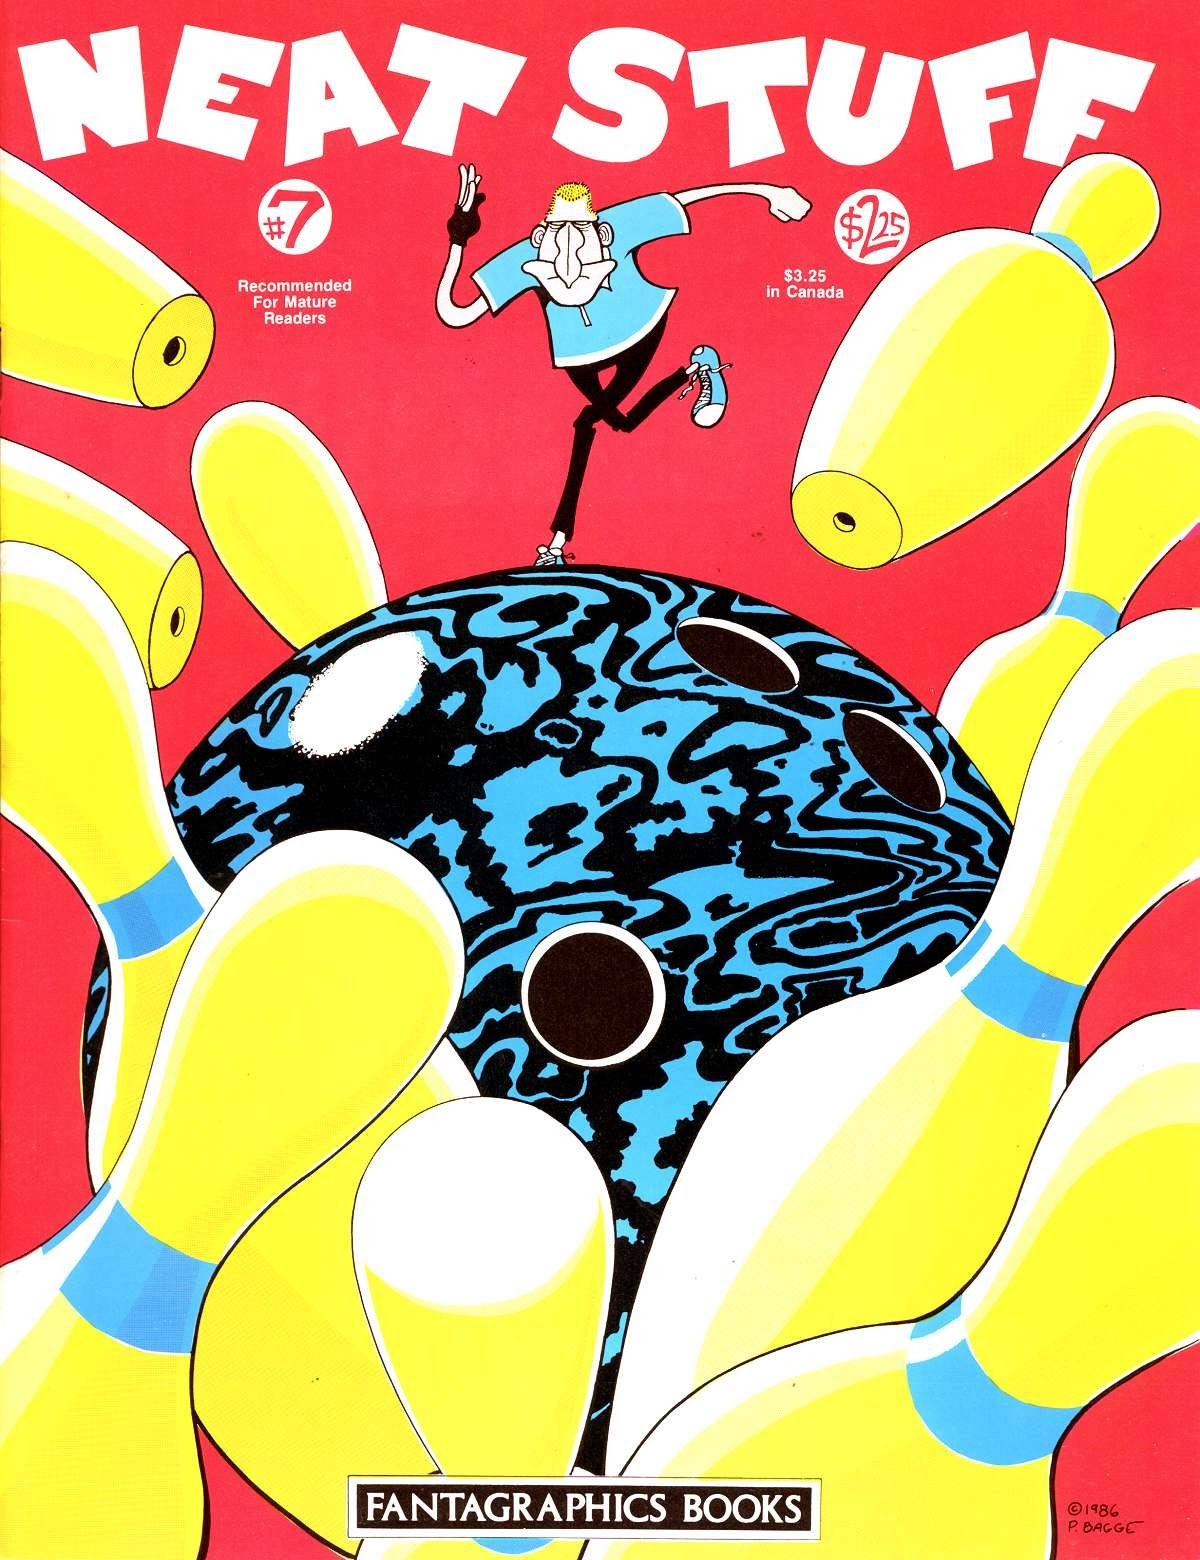 Read online Neat Stuff comic -  Issue #7 - 1